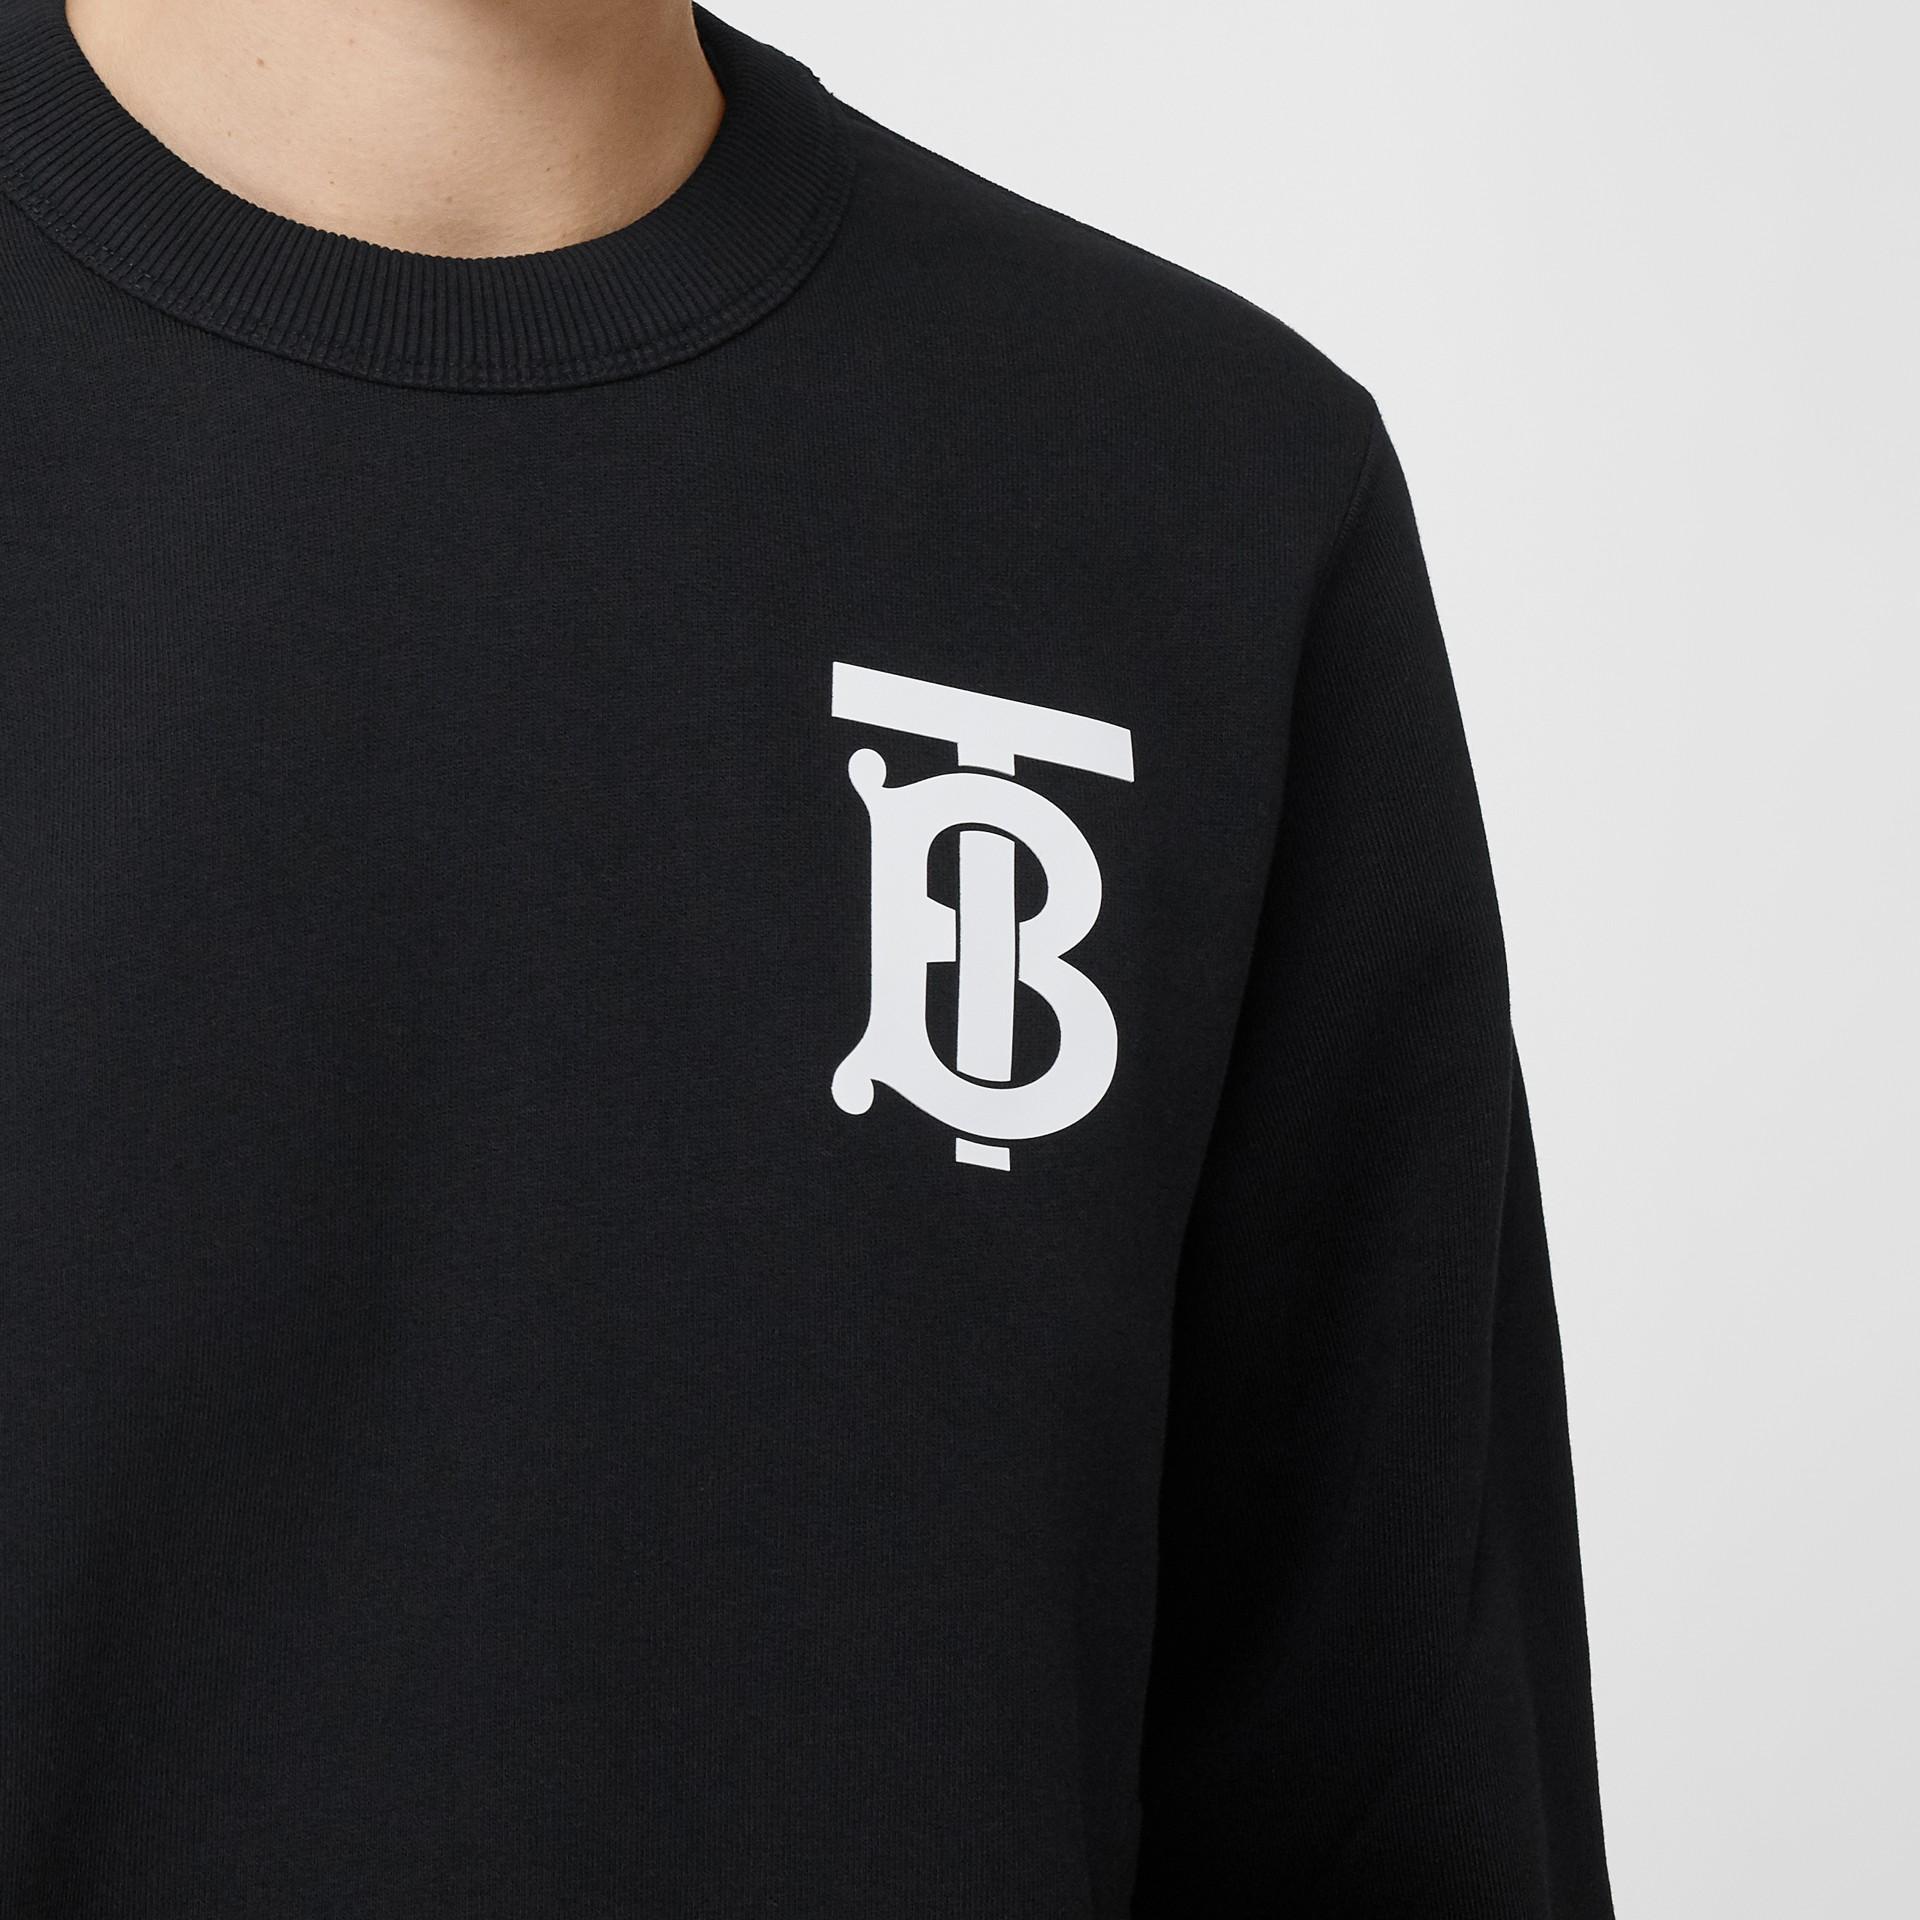 Monogram Motif Cotton Sweatshirt in Black - Women | Burberry - gallery image 1